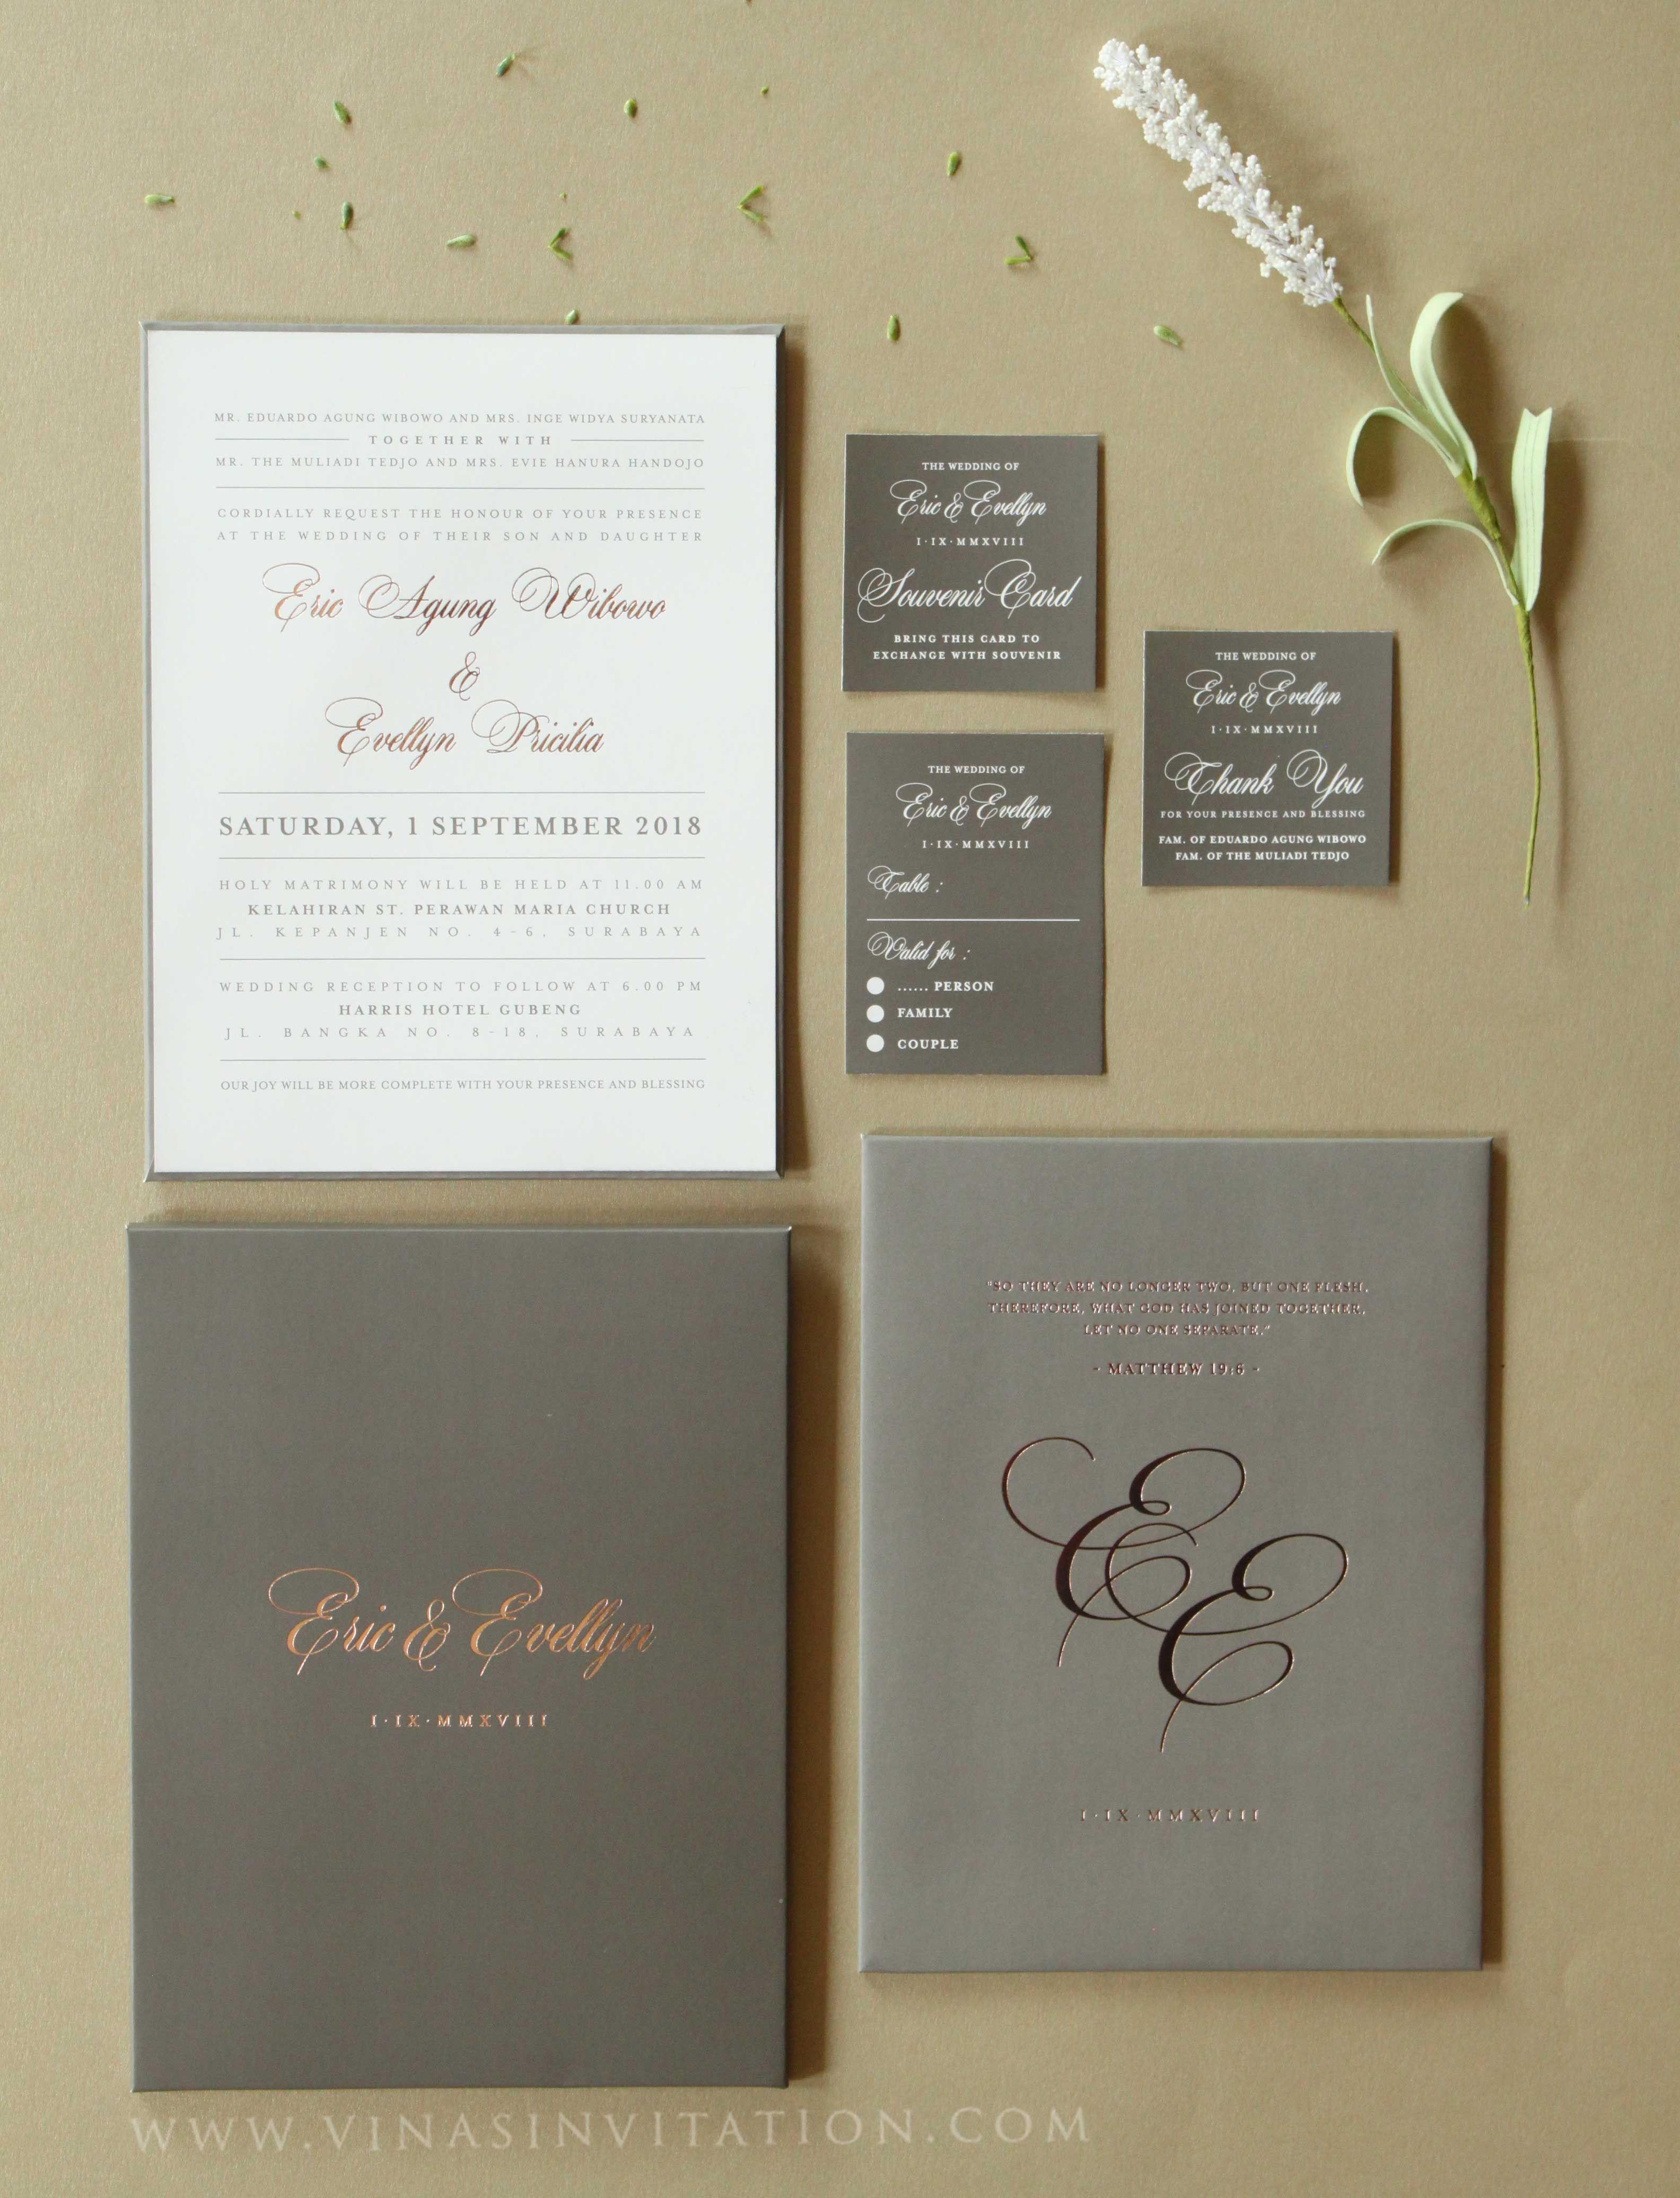 Vinas Invitation Simple Elegant Wedding Invitation Sydney Wedding Invitation Australia Wedding Invitation Gold Font Invitation Simple Luxury Invita Undangan